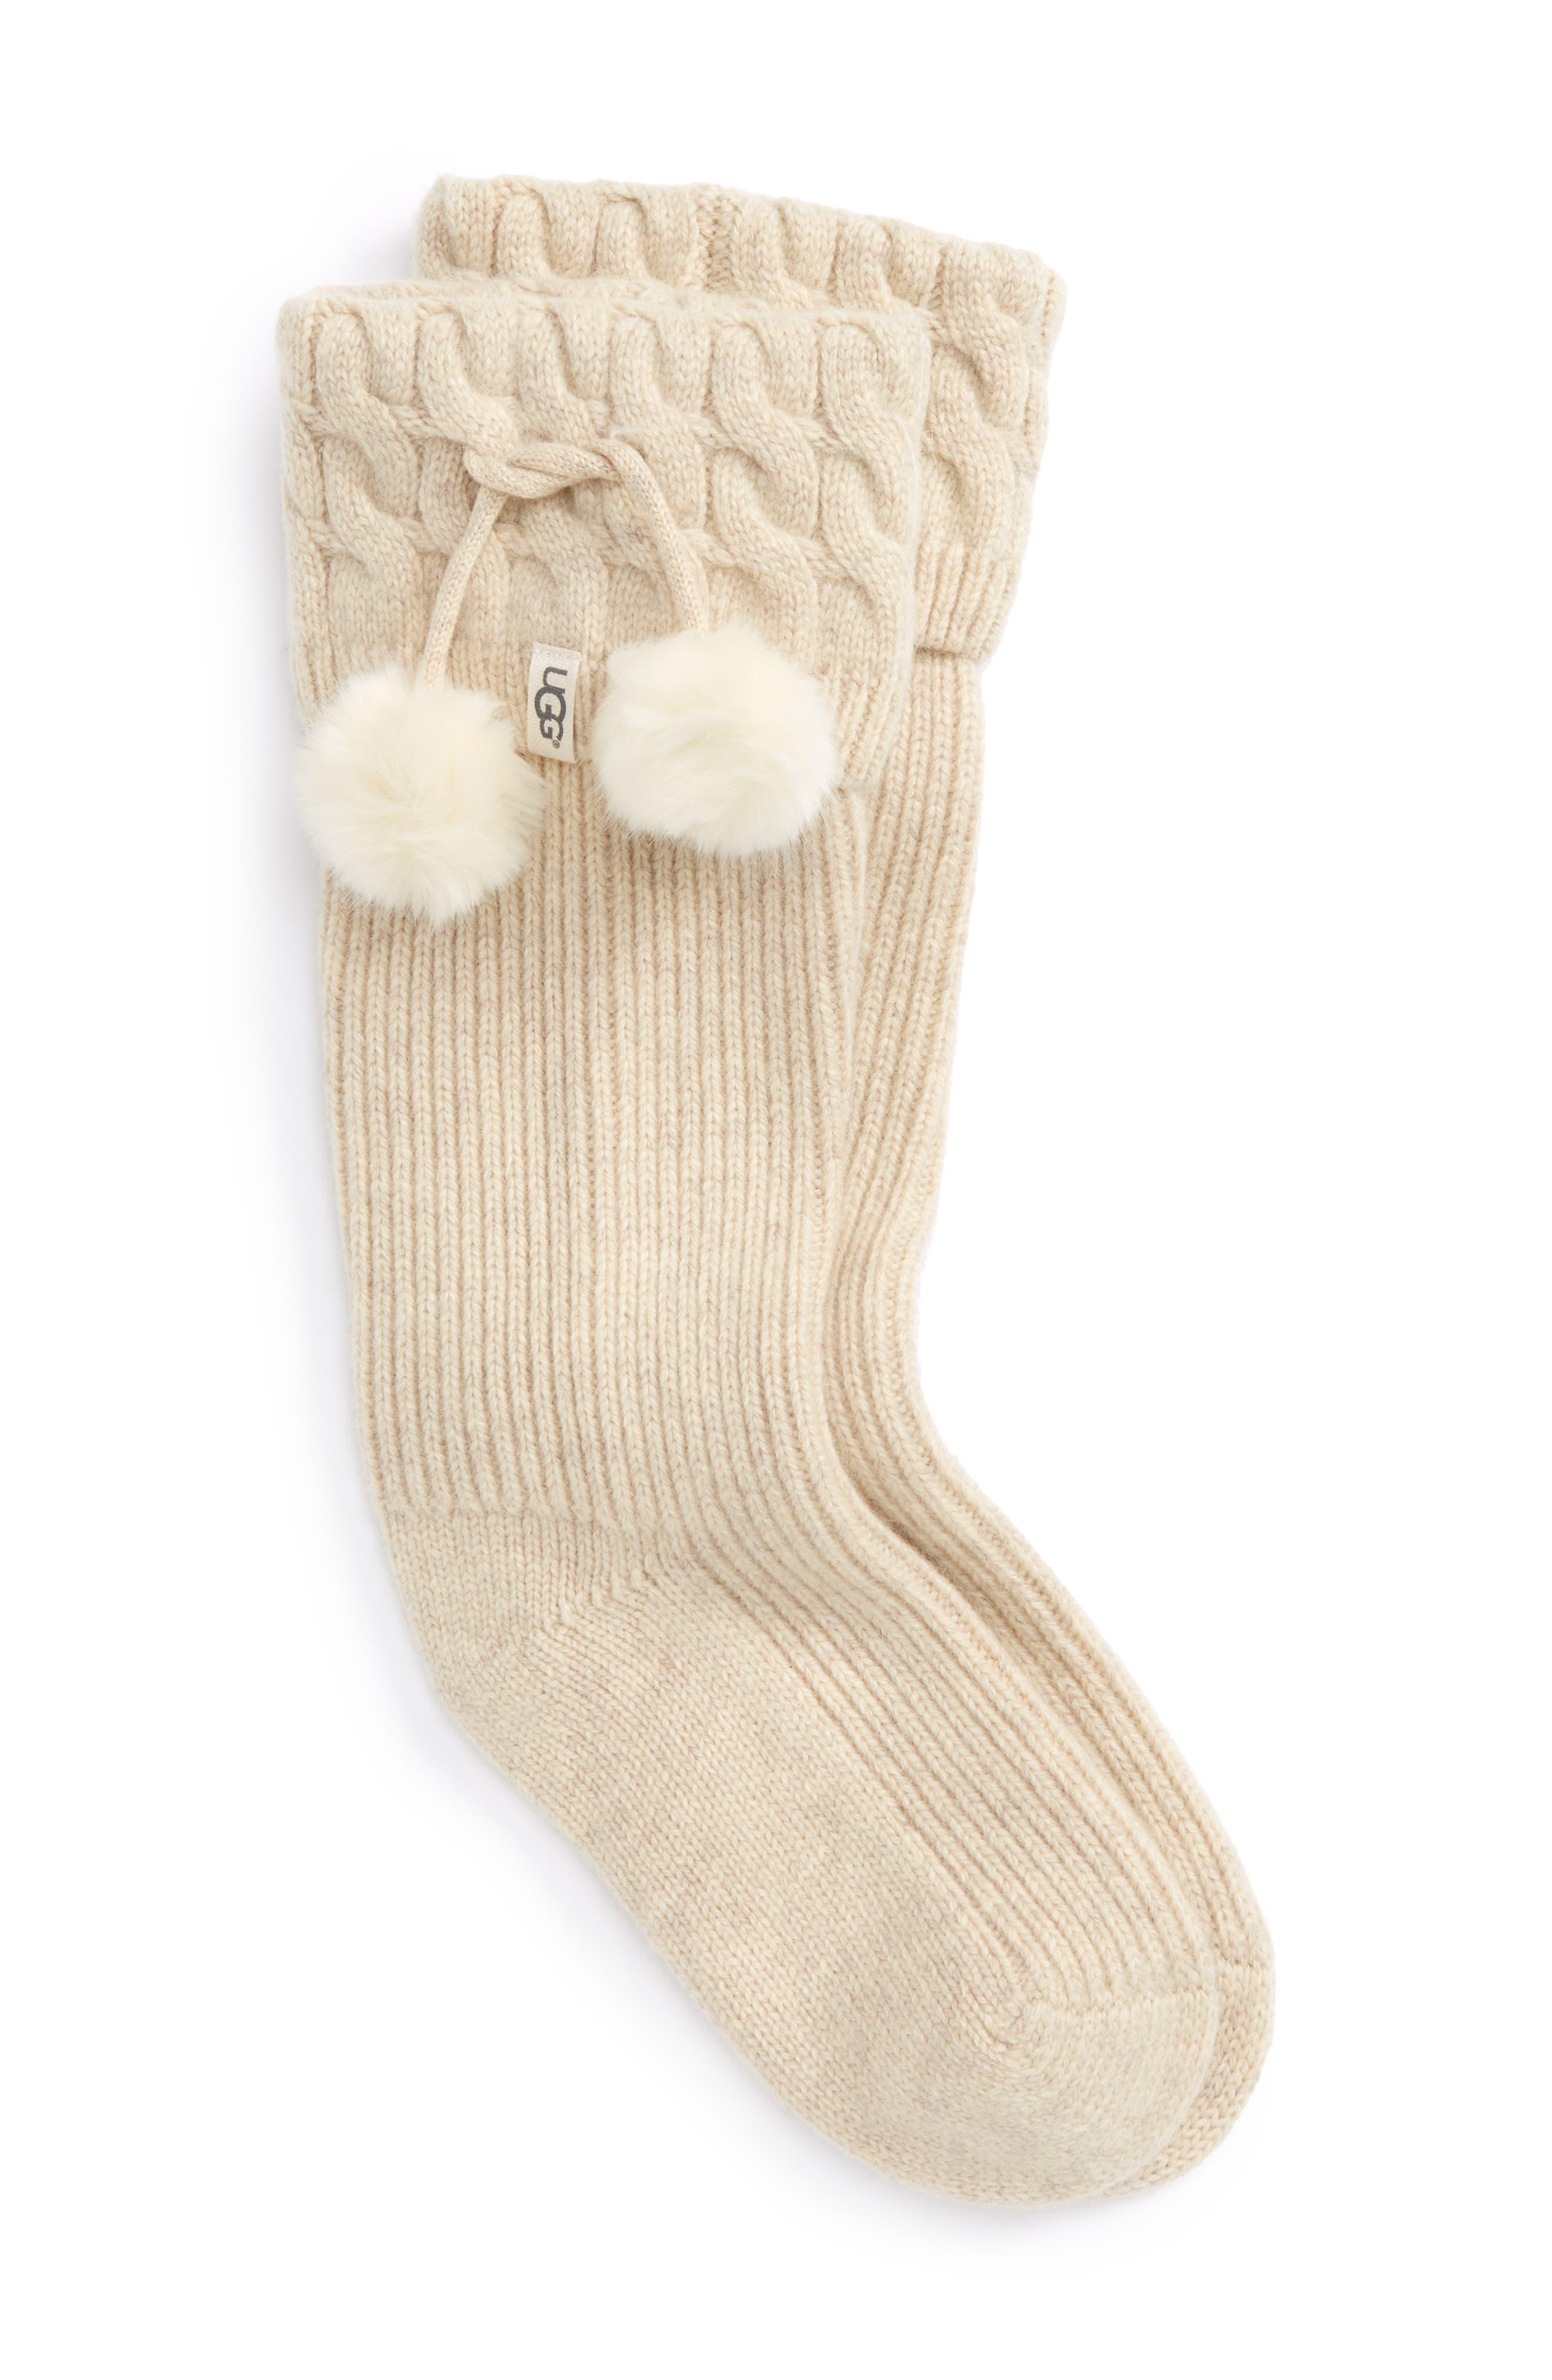 UGG UGGpure<sup>™</sup> Pompom Tall Rain Boot Sock,                         Main,                         color, Cream Heather Wool